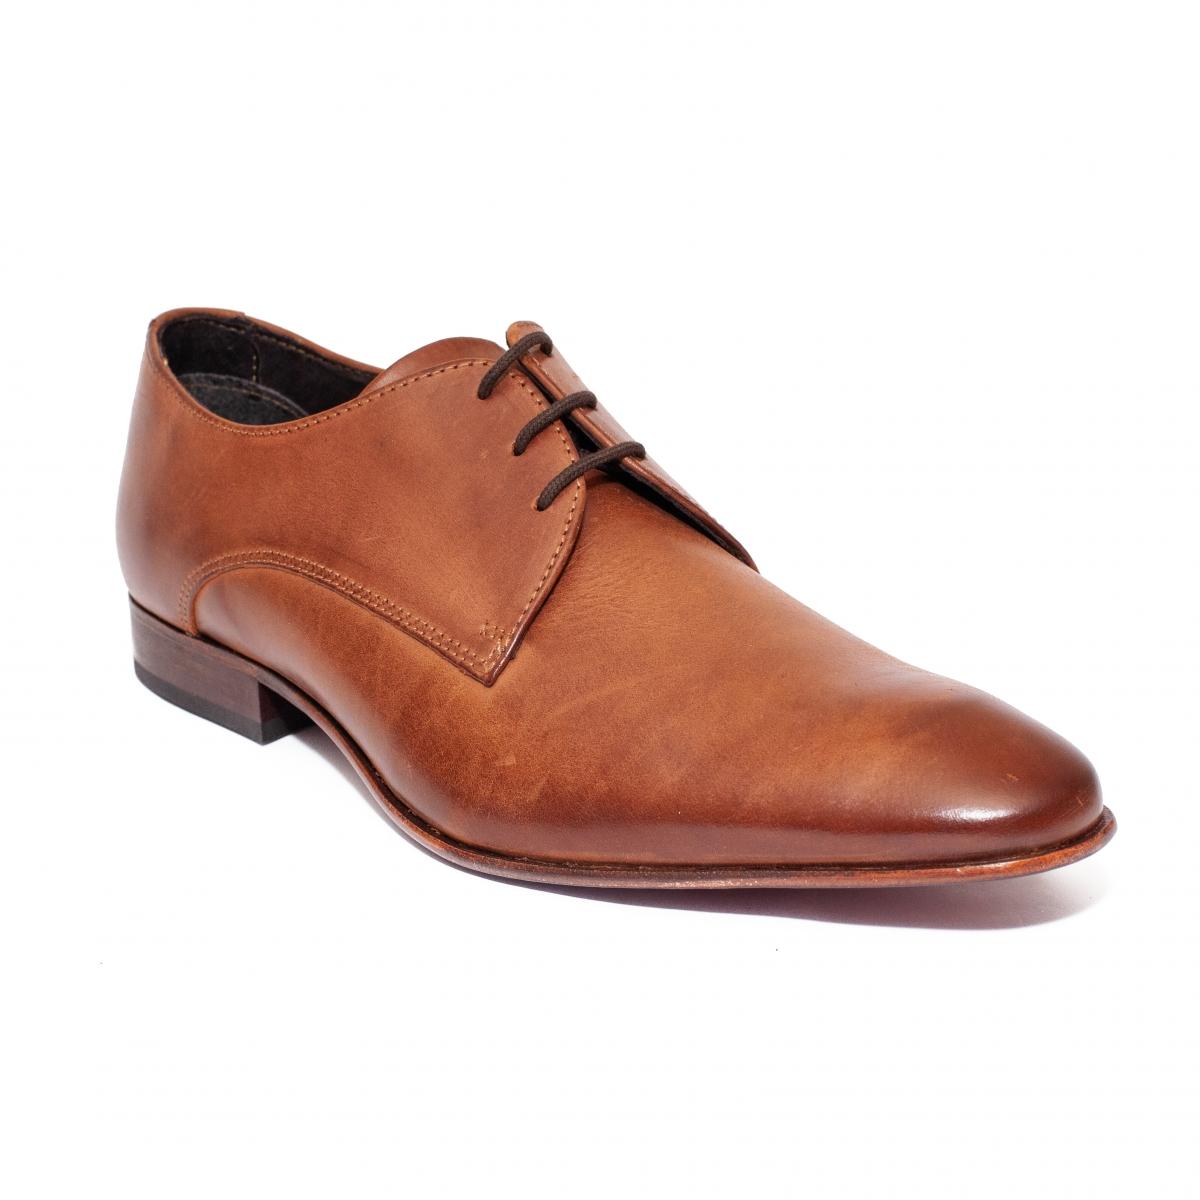 Pantofi barbati Pier one 260R01 maro coniac 40-46